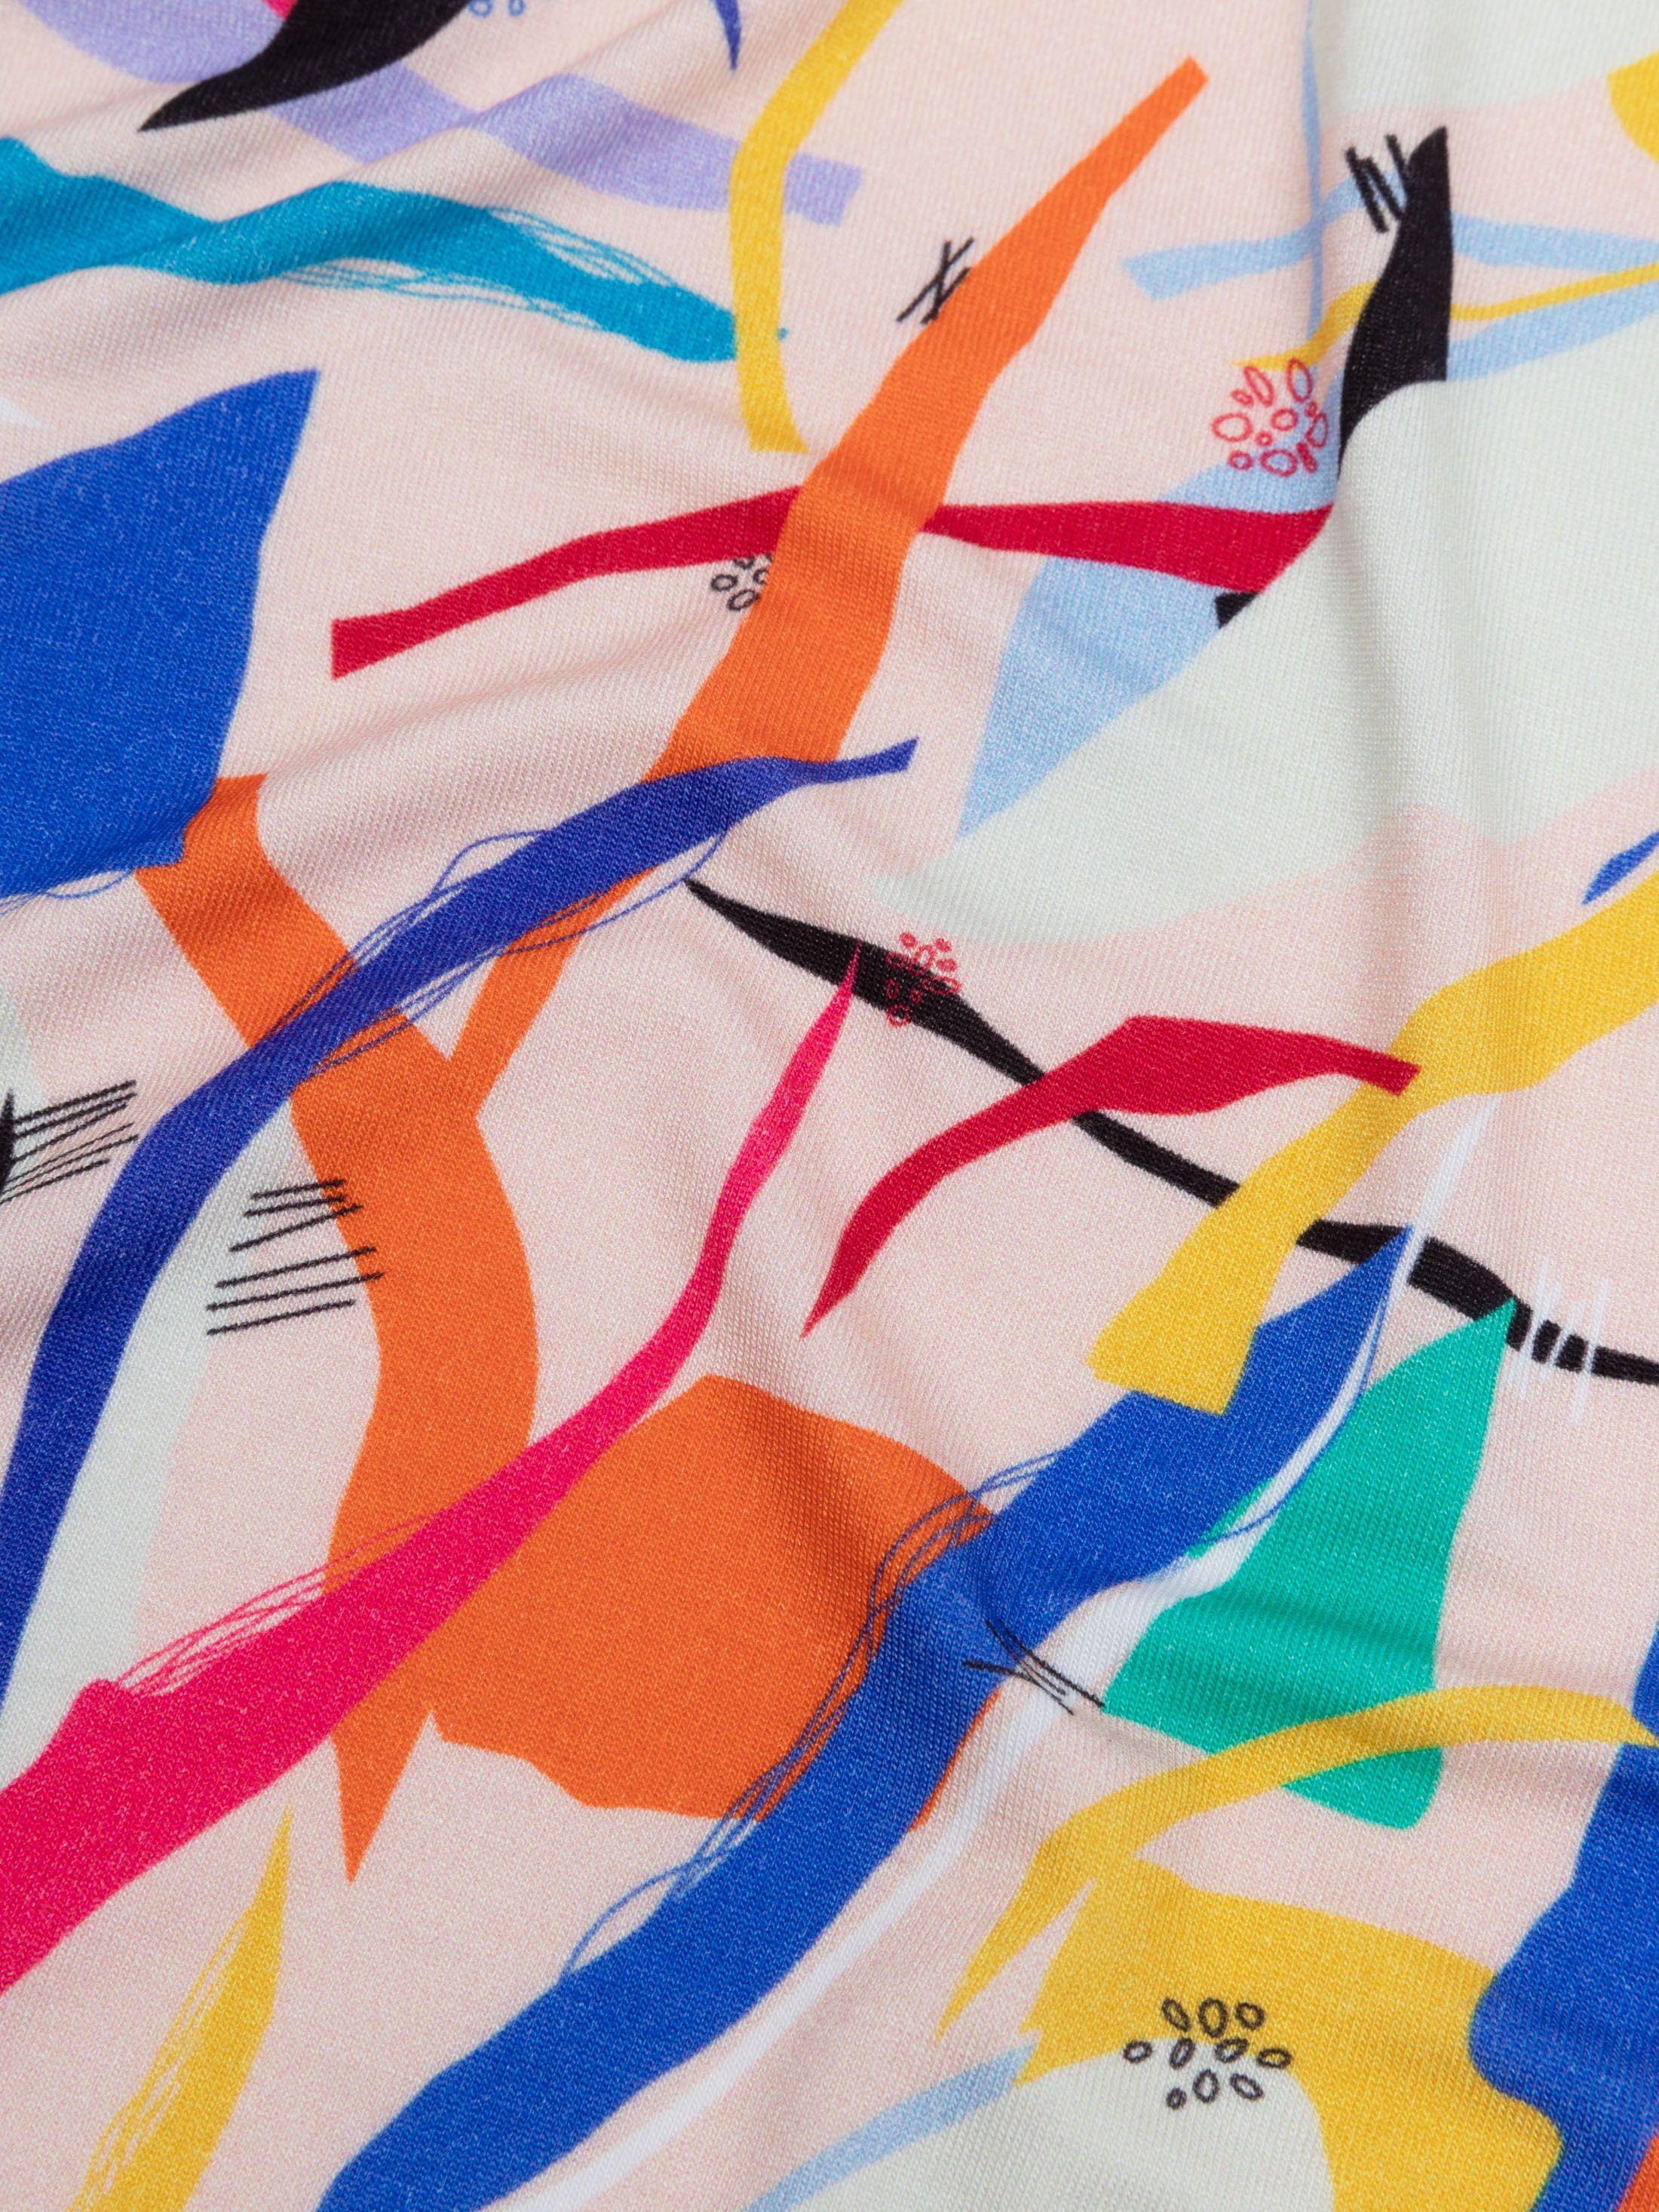 Custom viscose jersey fabric